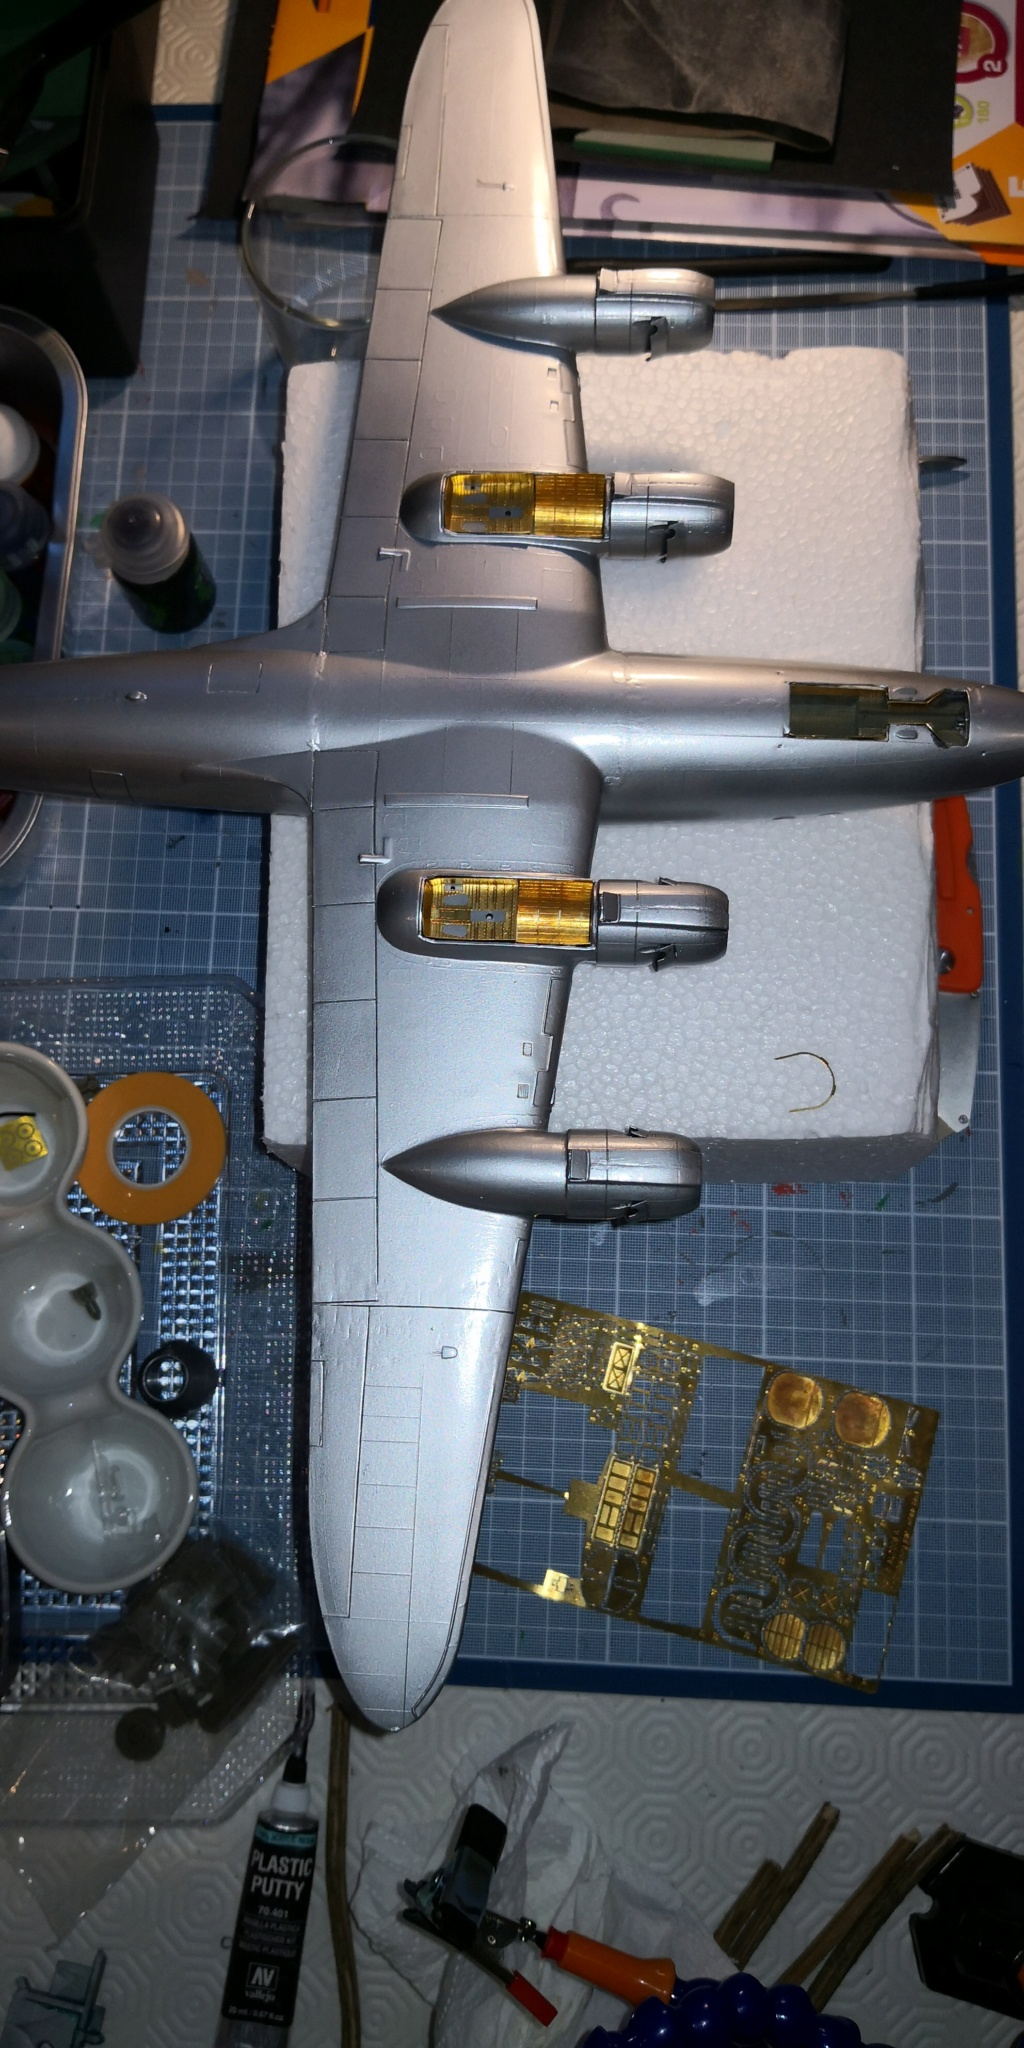 [HELLER] LOCKHEED CONSTELLATION C-121-A MATS BERLIN 1948 - 1949 1/72ème Réf 80382 - Page 2 Img_2030